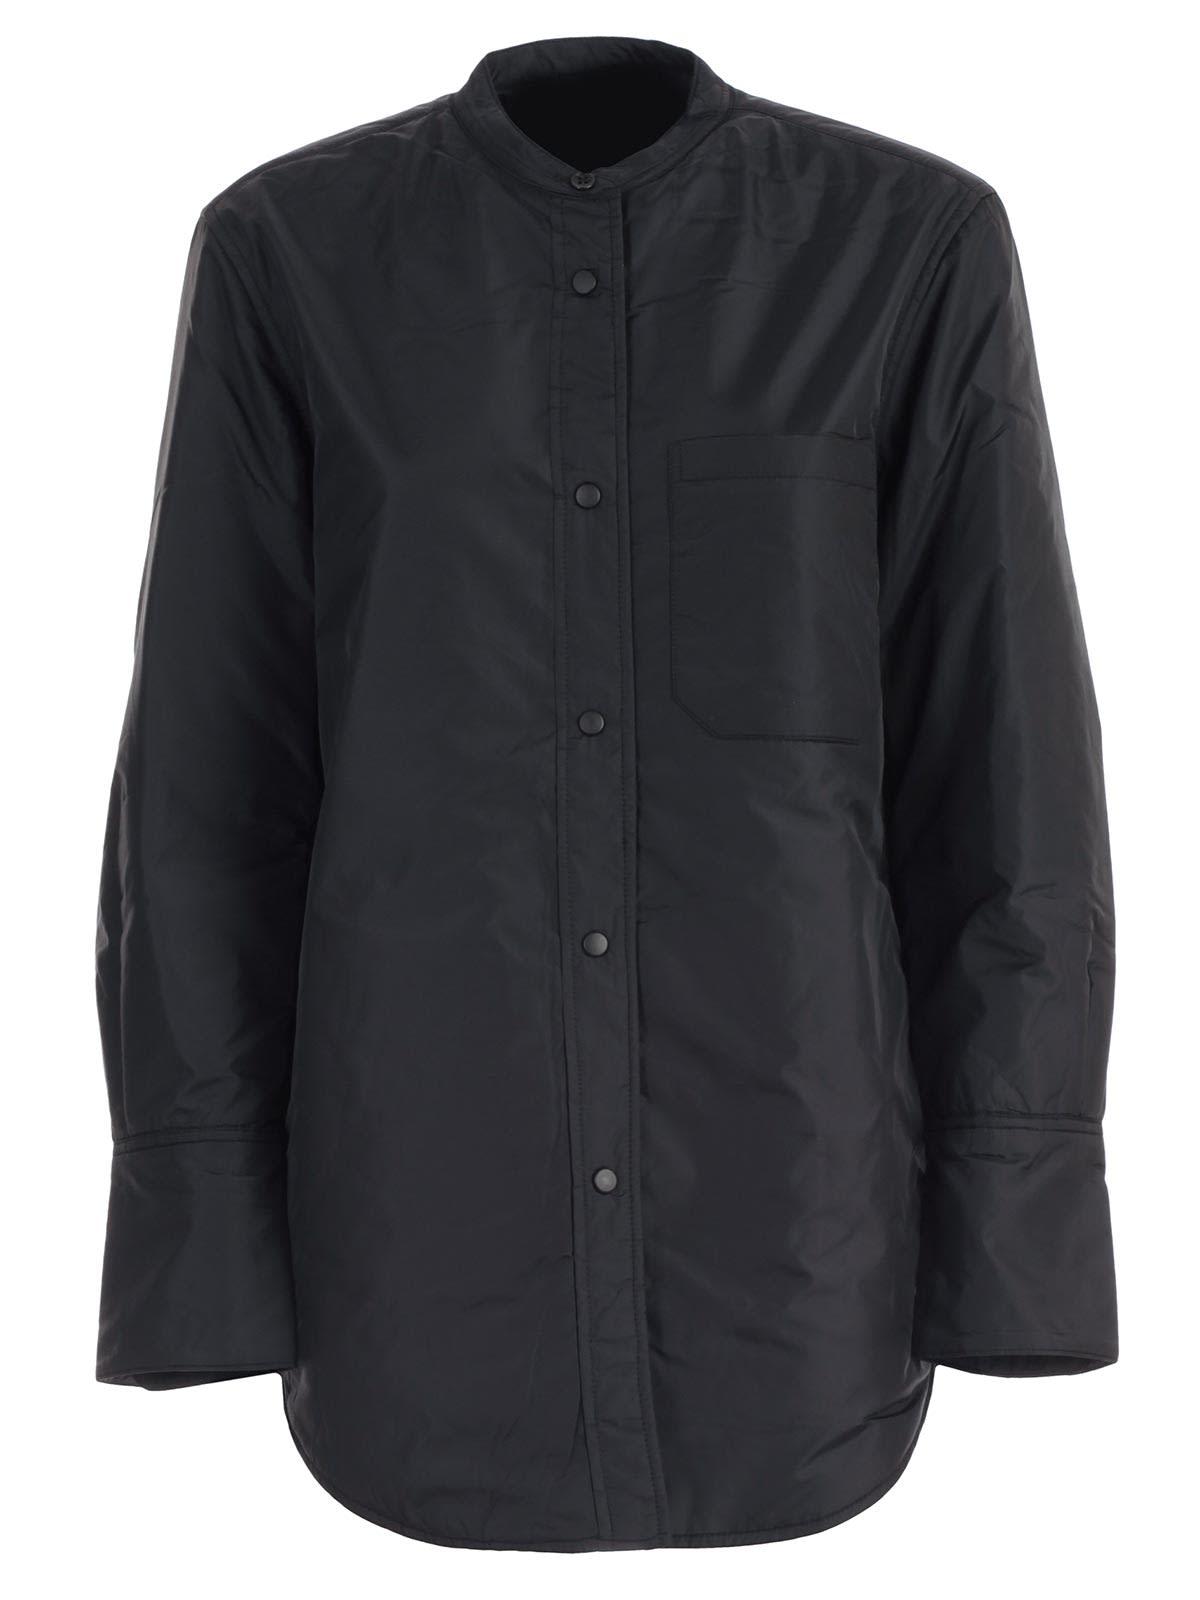 Photo of  Aspesi Shirt Crew Neck Nylon- shop Aspesi jackets online sales